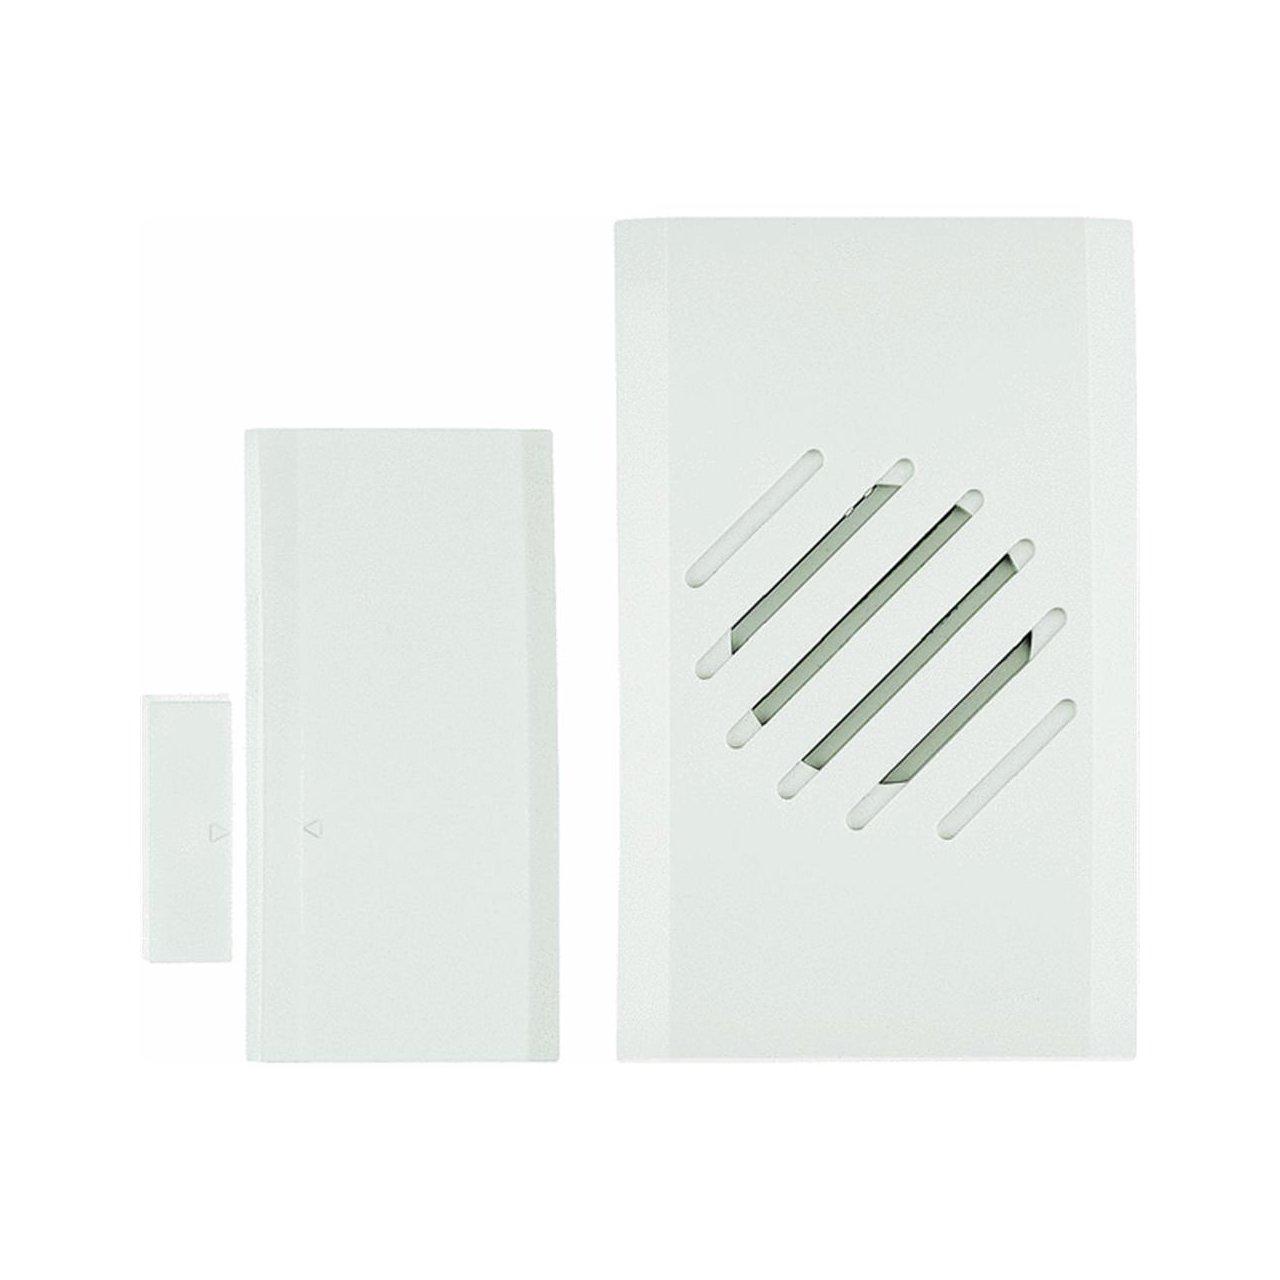 Carlon RC3760D 610342 Alarm Plug In Entrance Alert 150\' Range